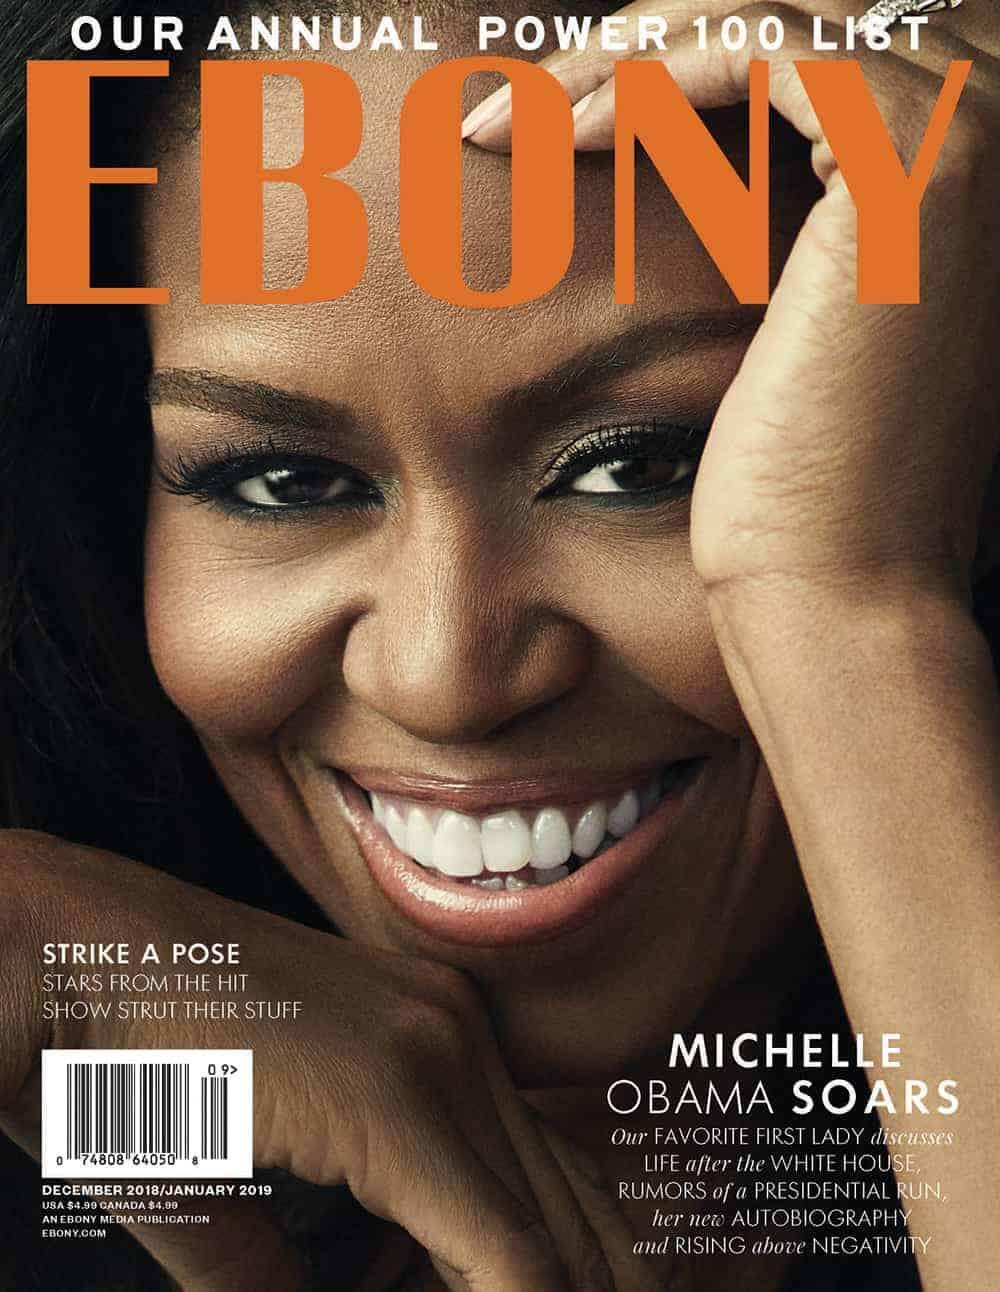 EBONY, Michelle Obama